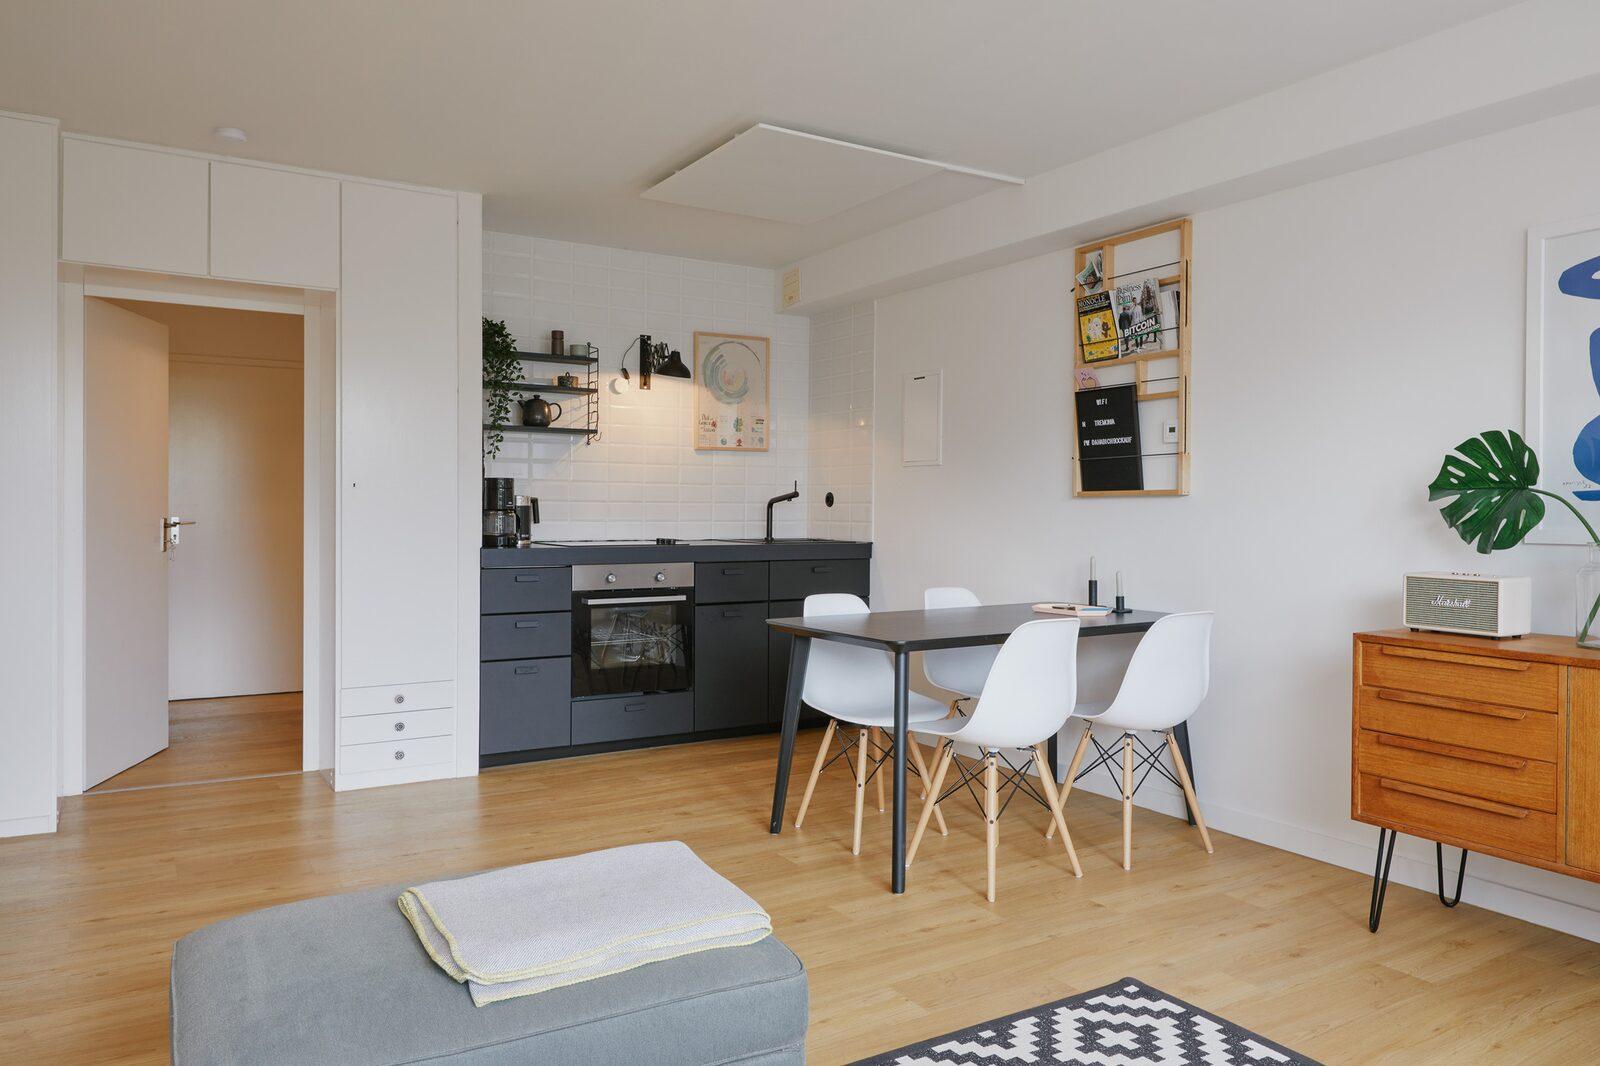 Appartement - Am Waltenberg 70-MS | Winterberg 'Tremonia'